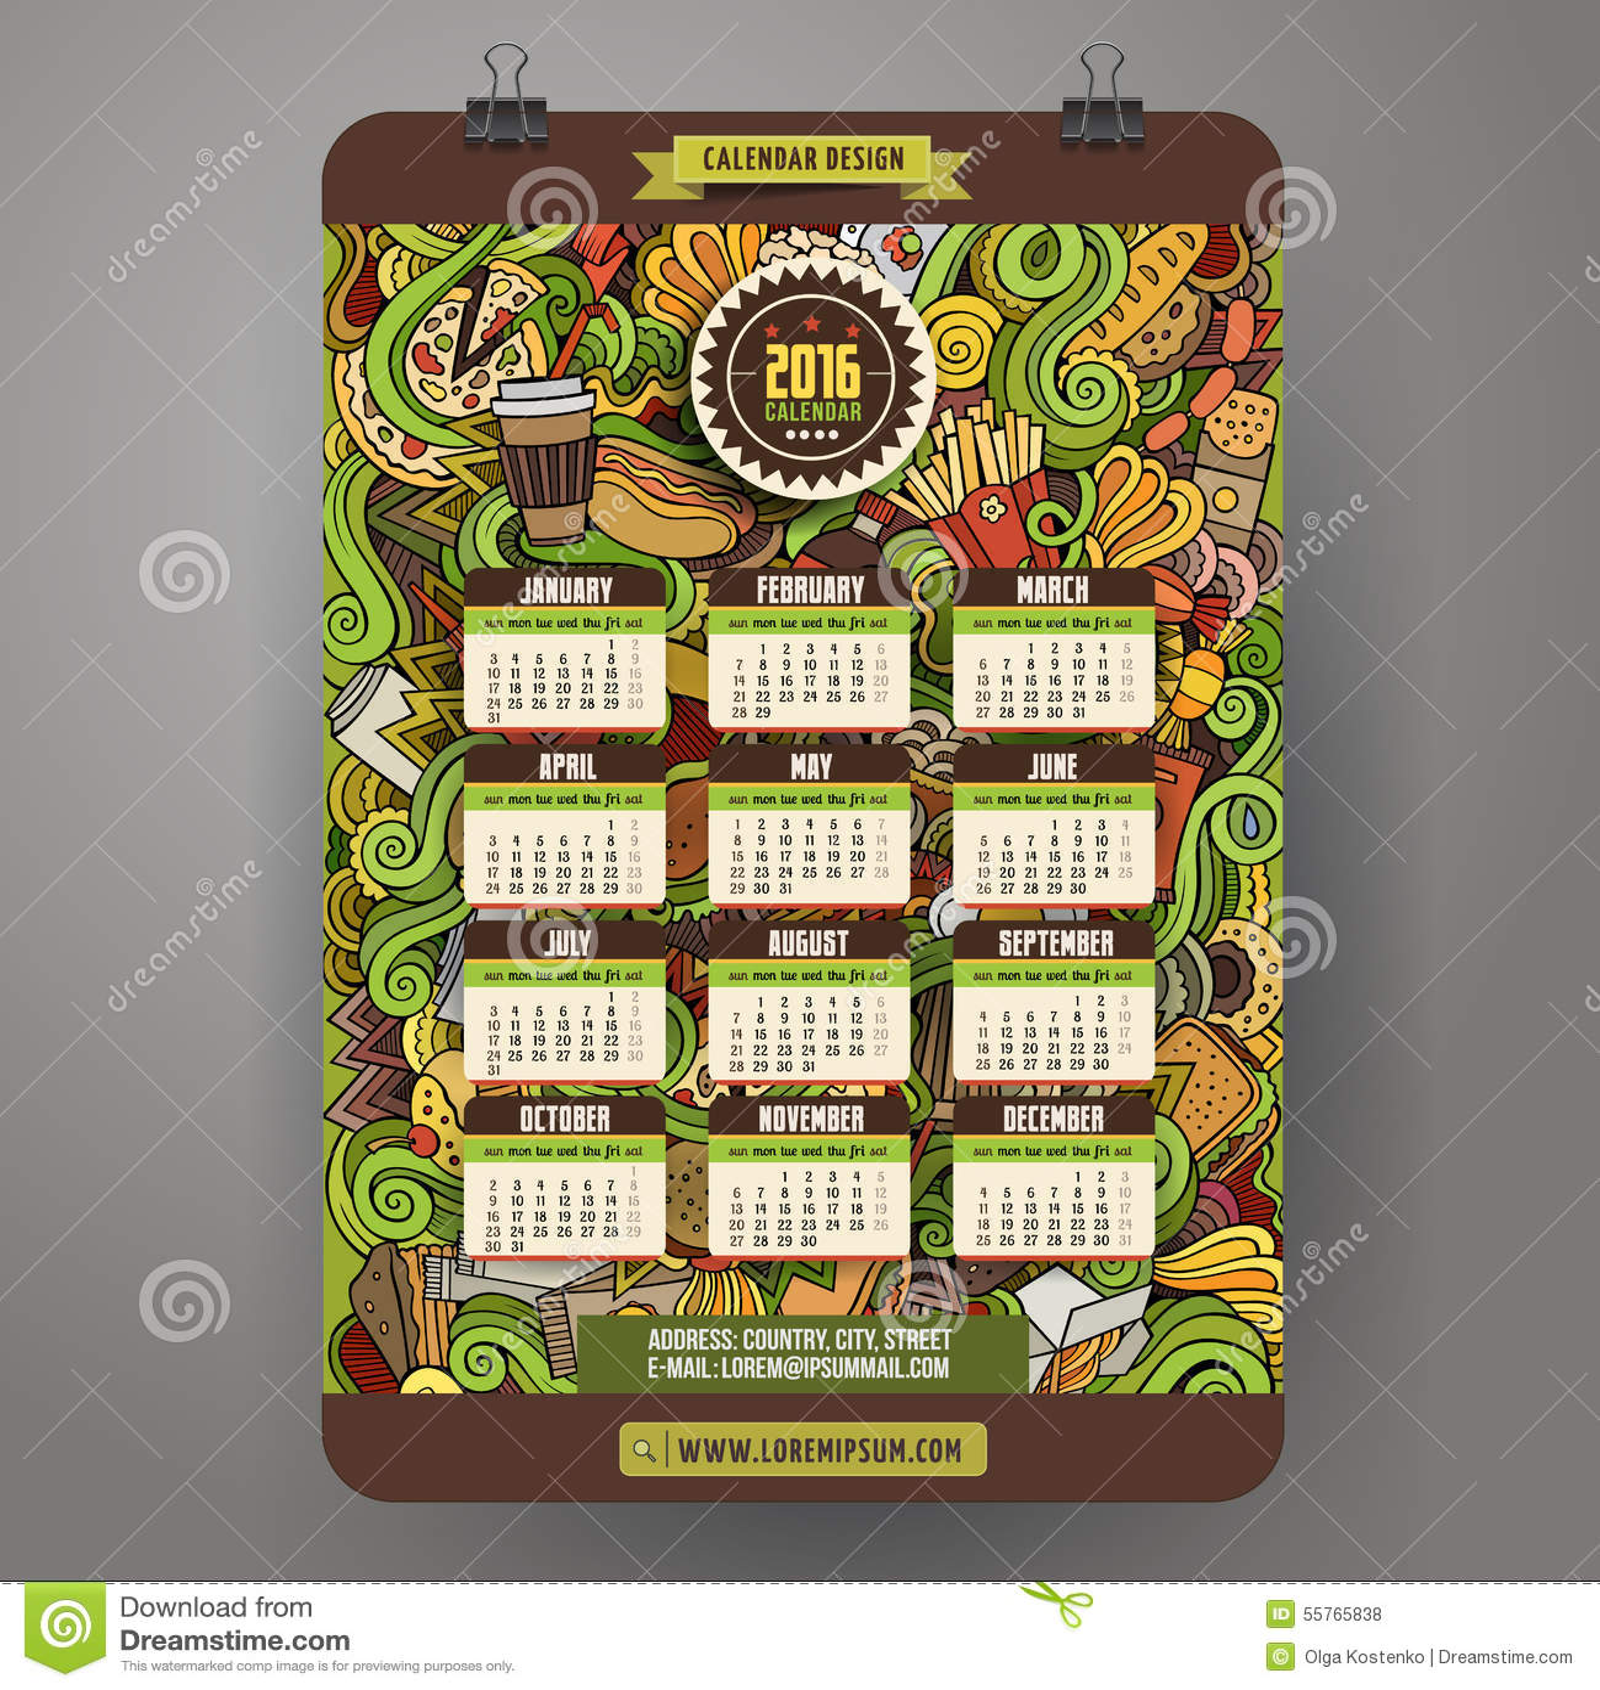 Doodles Cartoon Fast Food Calendar 2016 Year Stock Vector